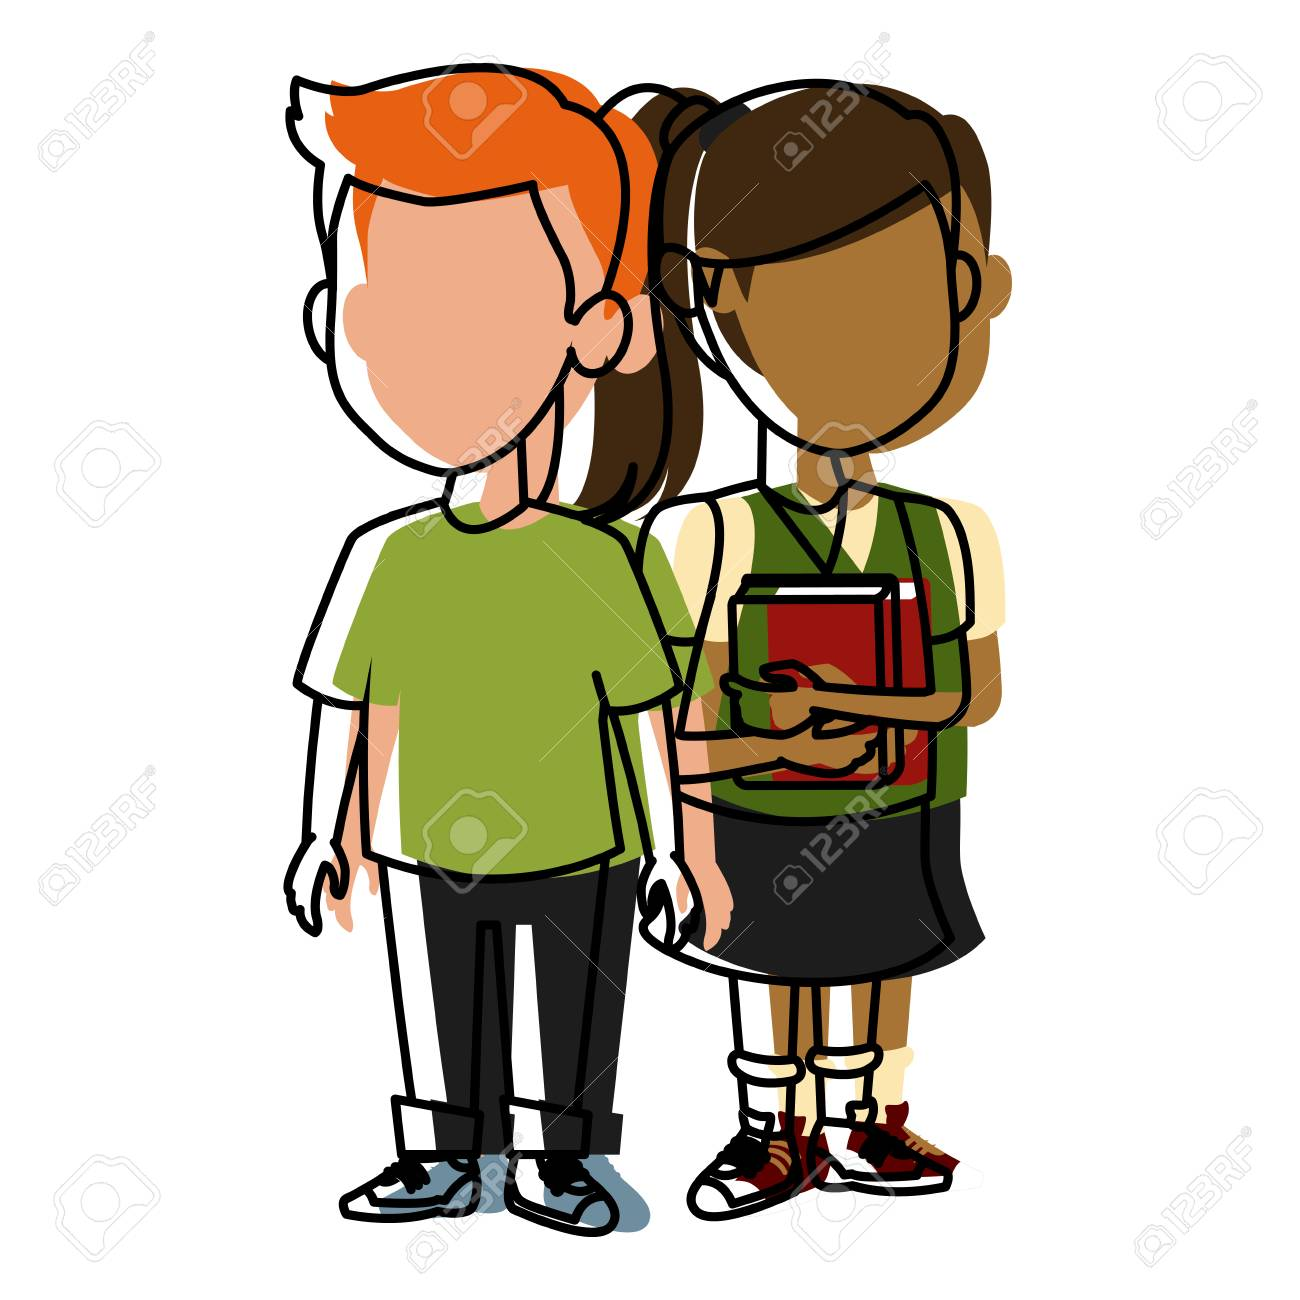 School Kids Friends Cartoon Icon Vector Illustration Royalty Free